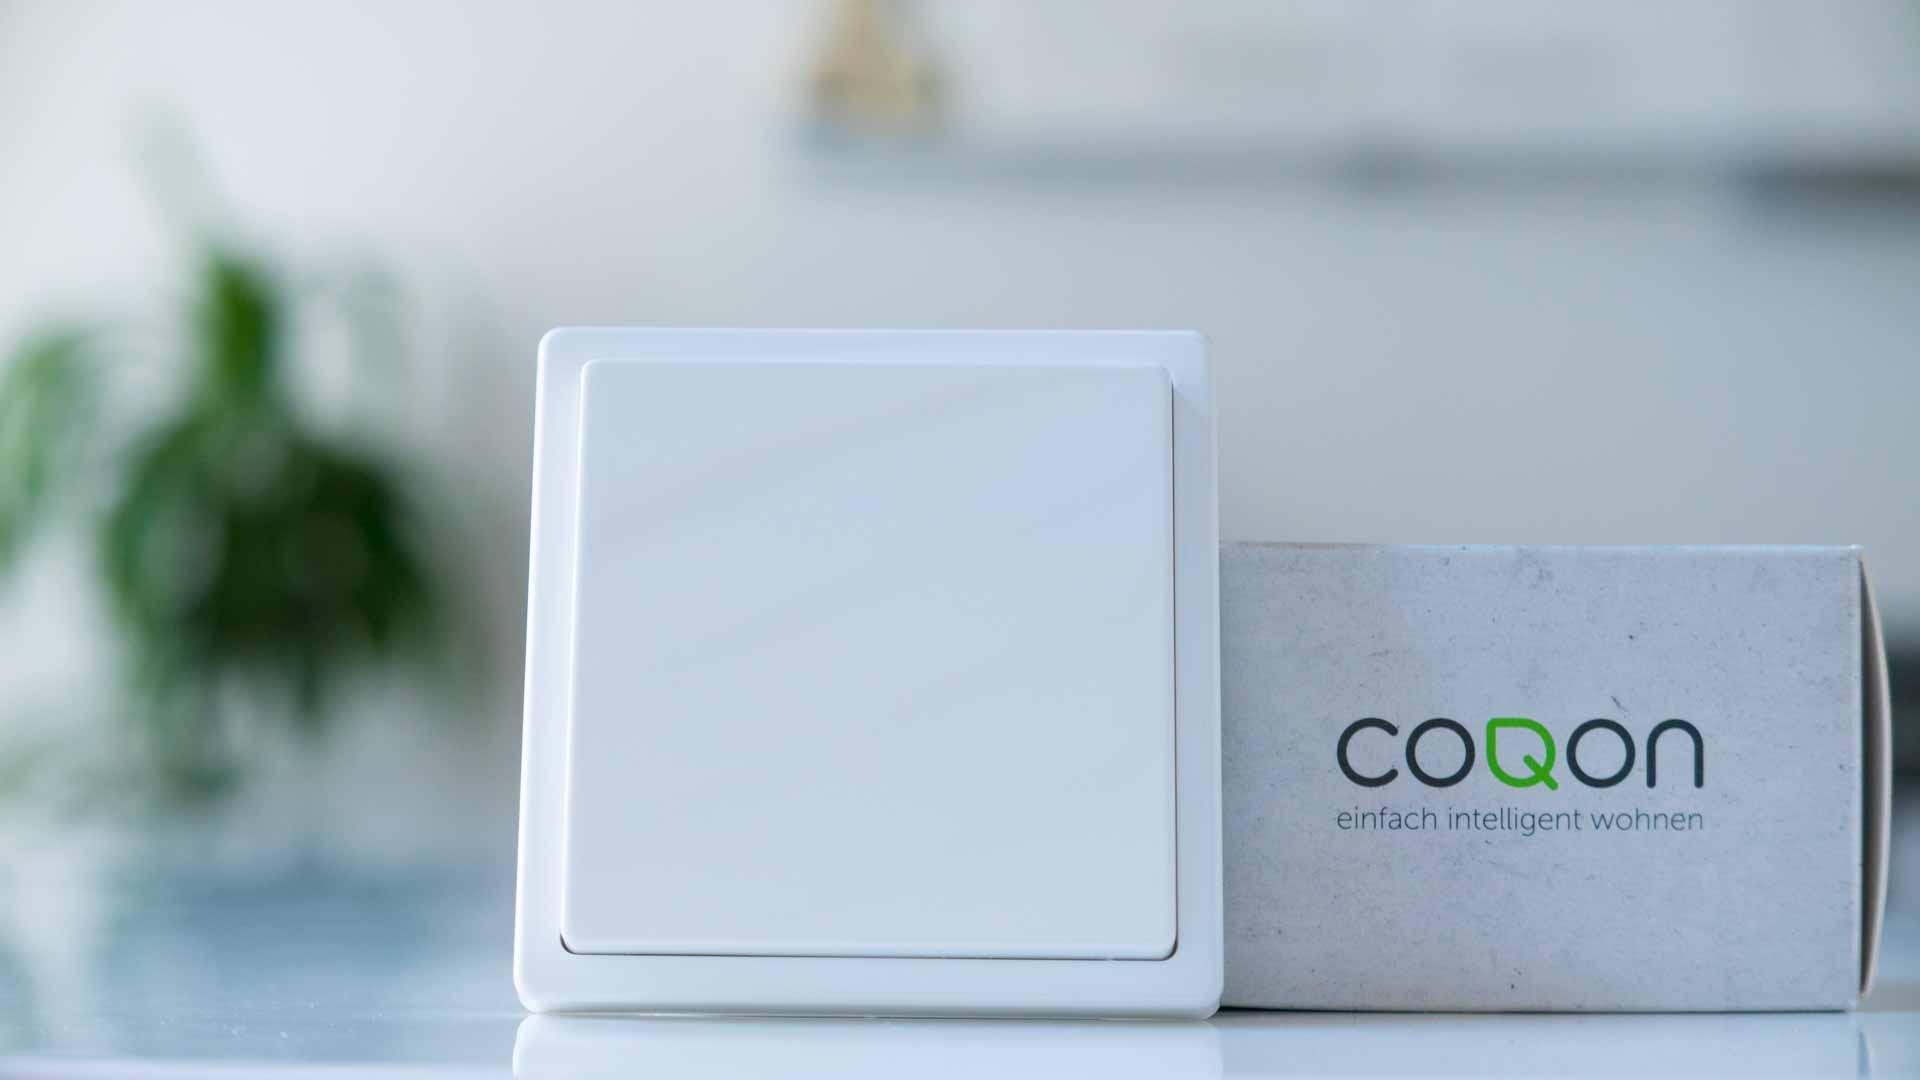 COQON-Wandtaster-Logo